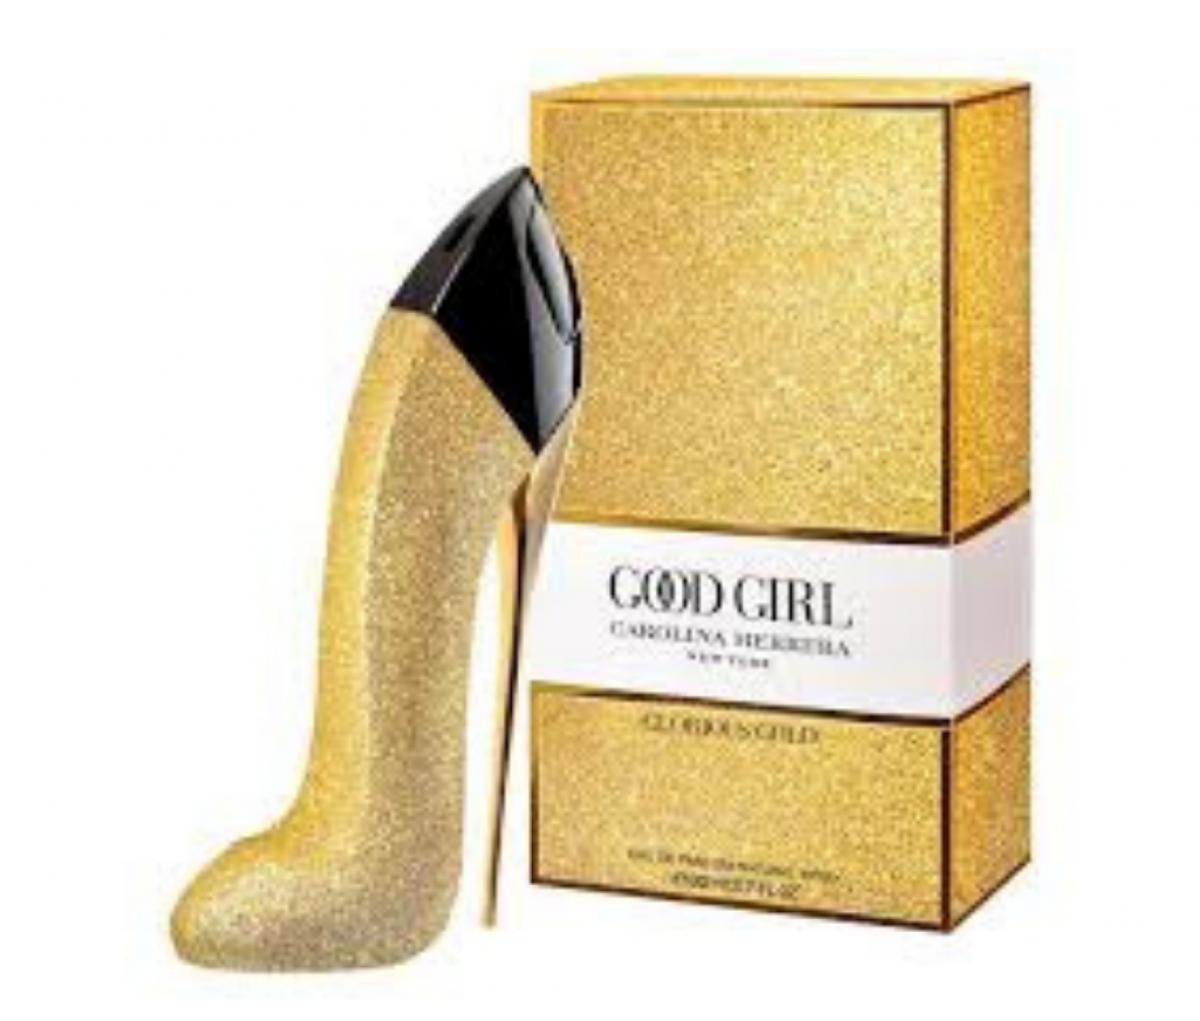 CAROLINA HERRERA GOOD GIRL GLORIOUS GOLD (W) EDP 50ML